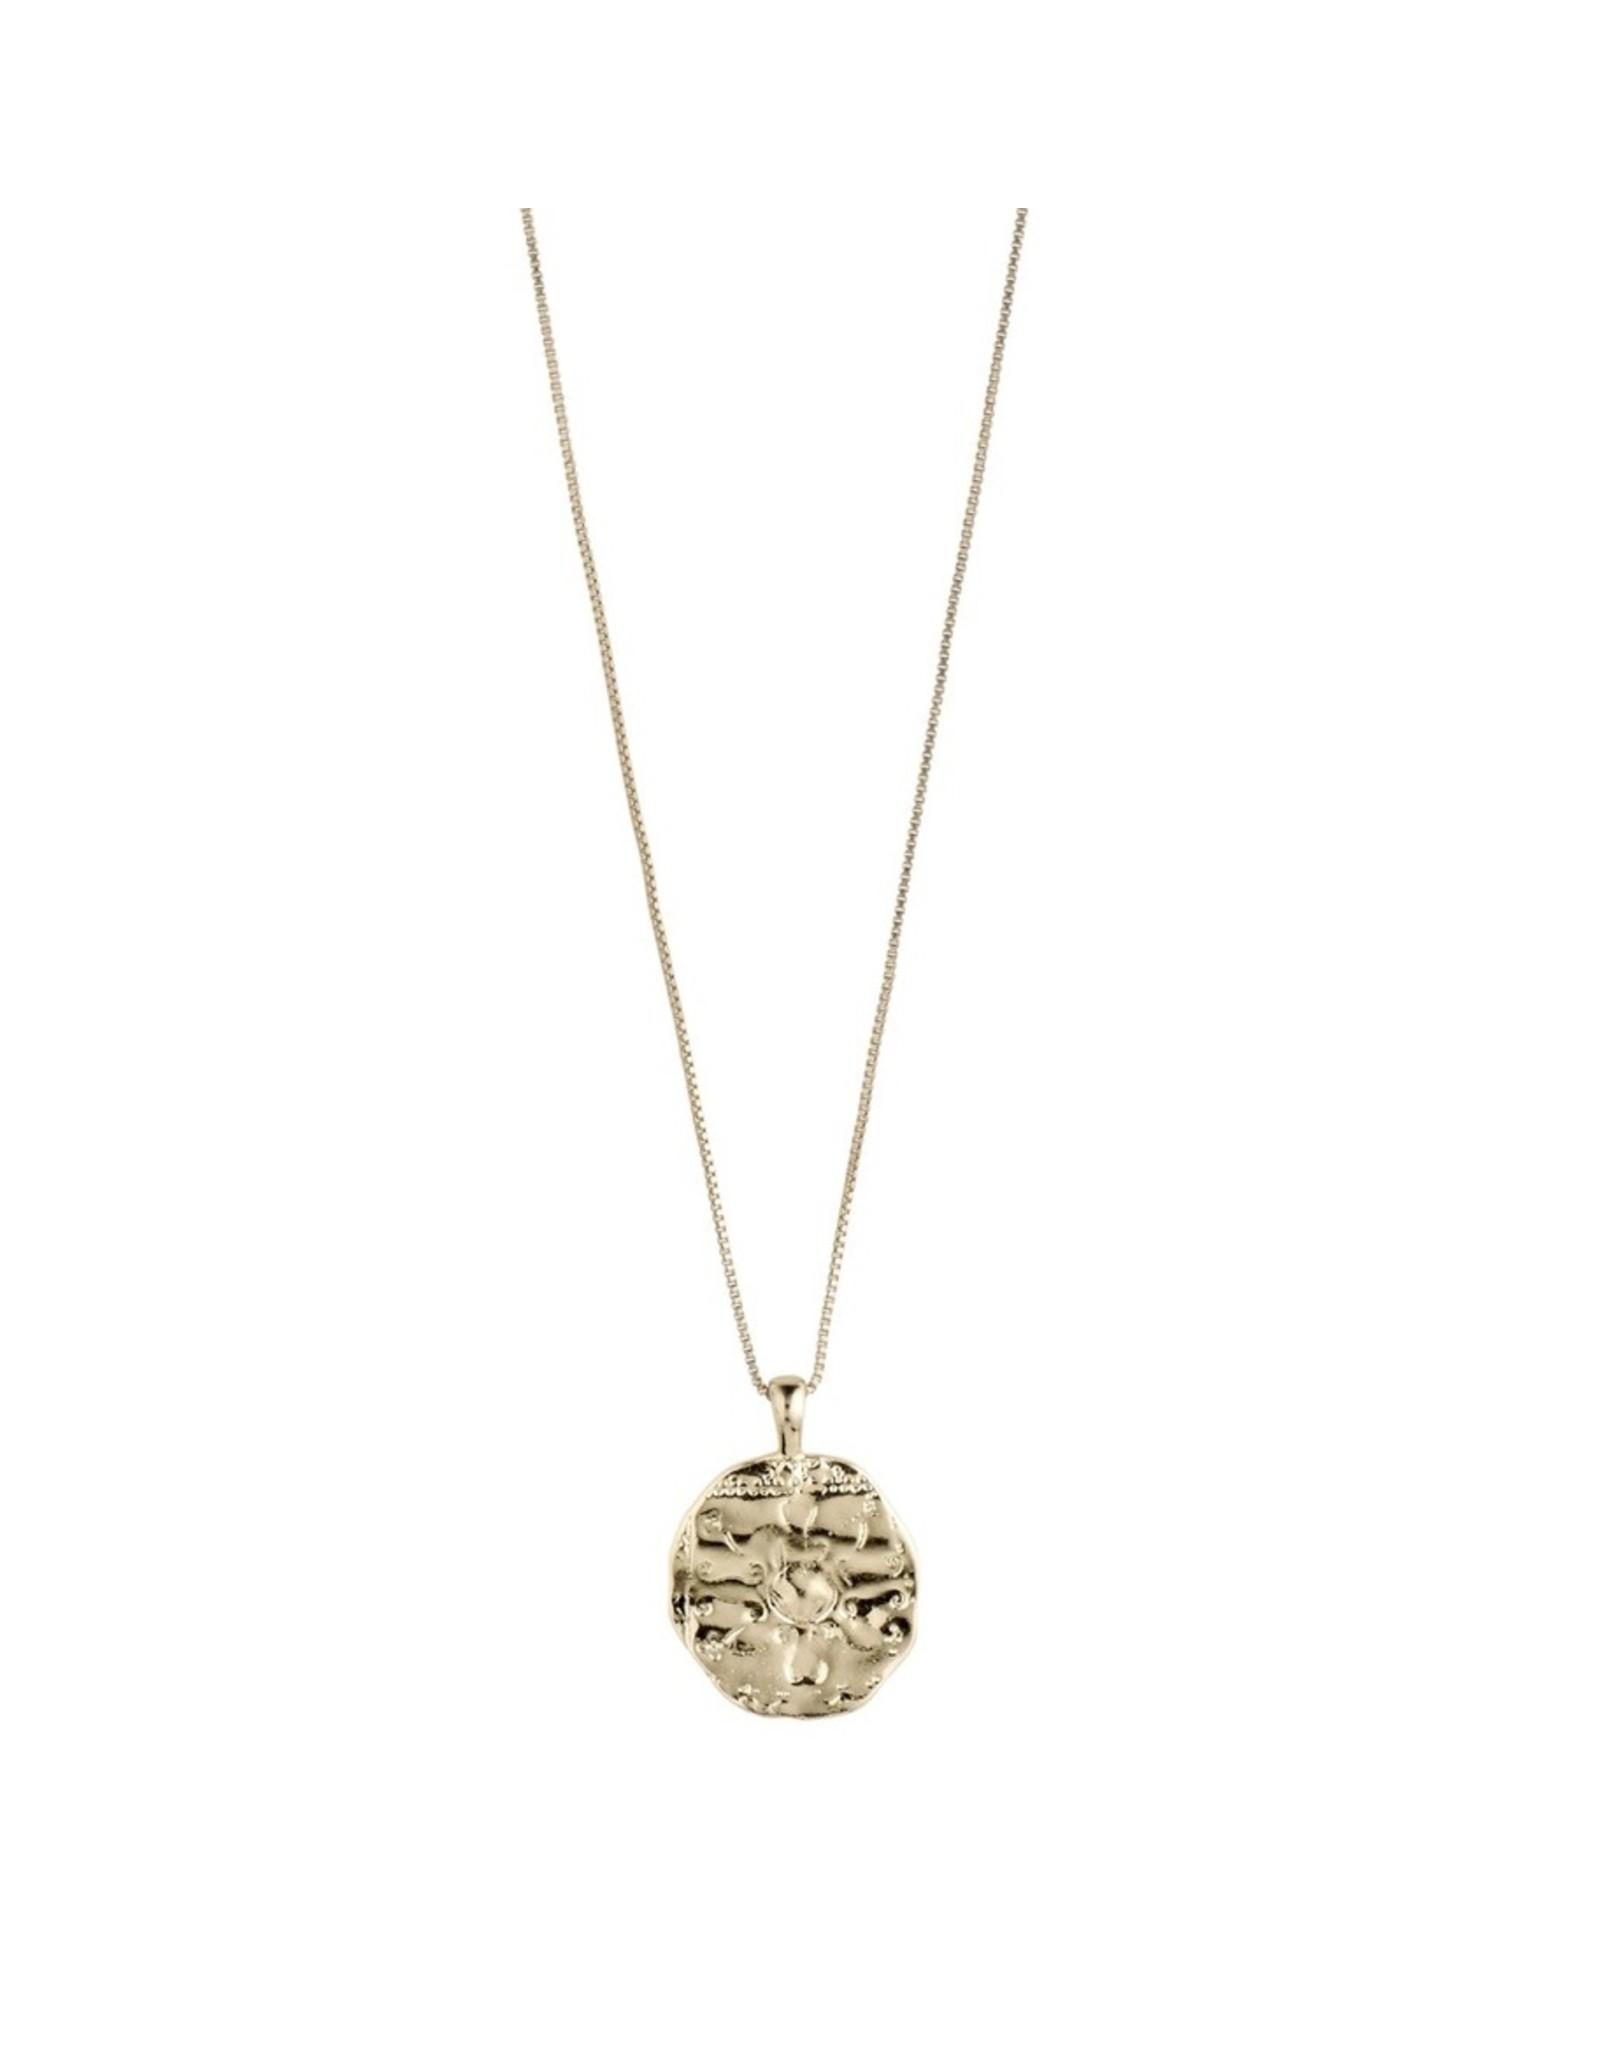 Pilgrim Pilgrim Necklace Affection, Gold Plated